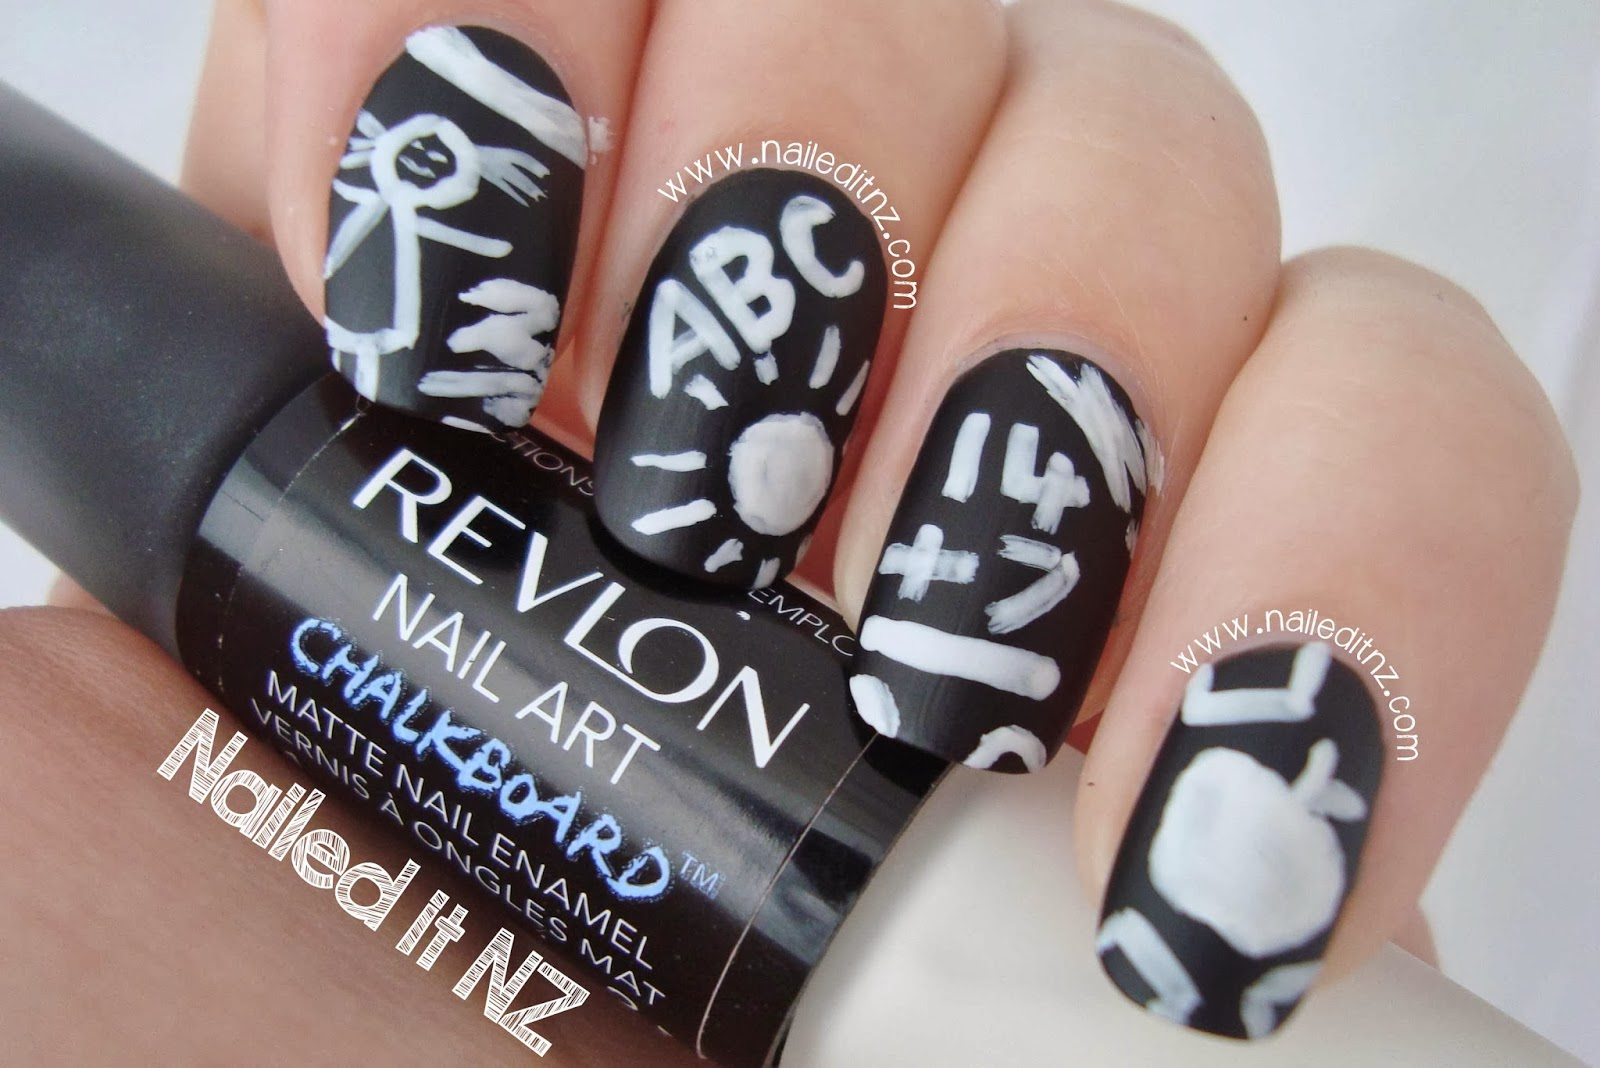 Revlon Chalkboard Nail Polish Review - Nail Ftempo